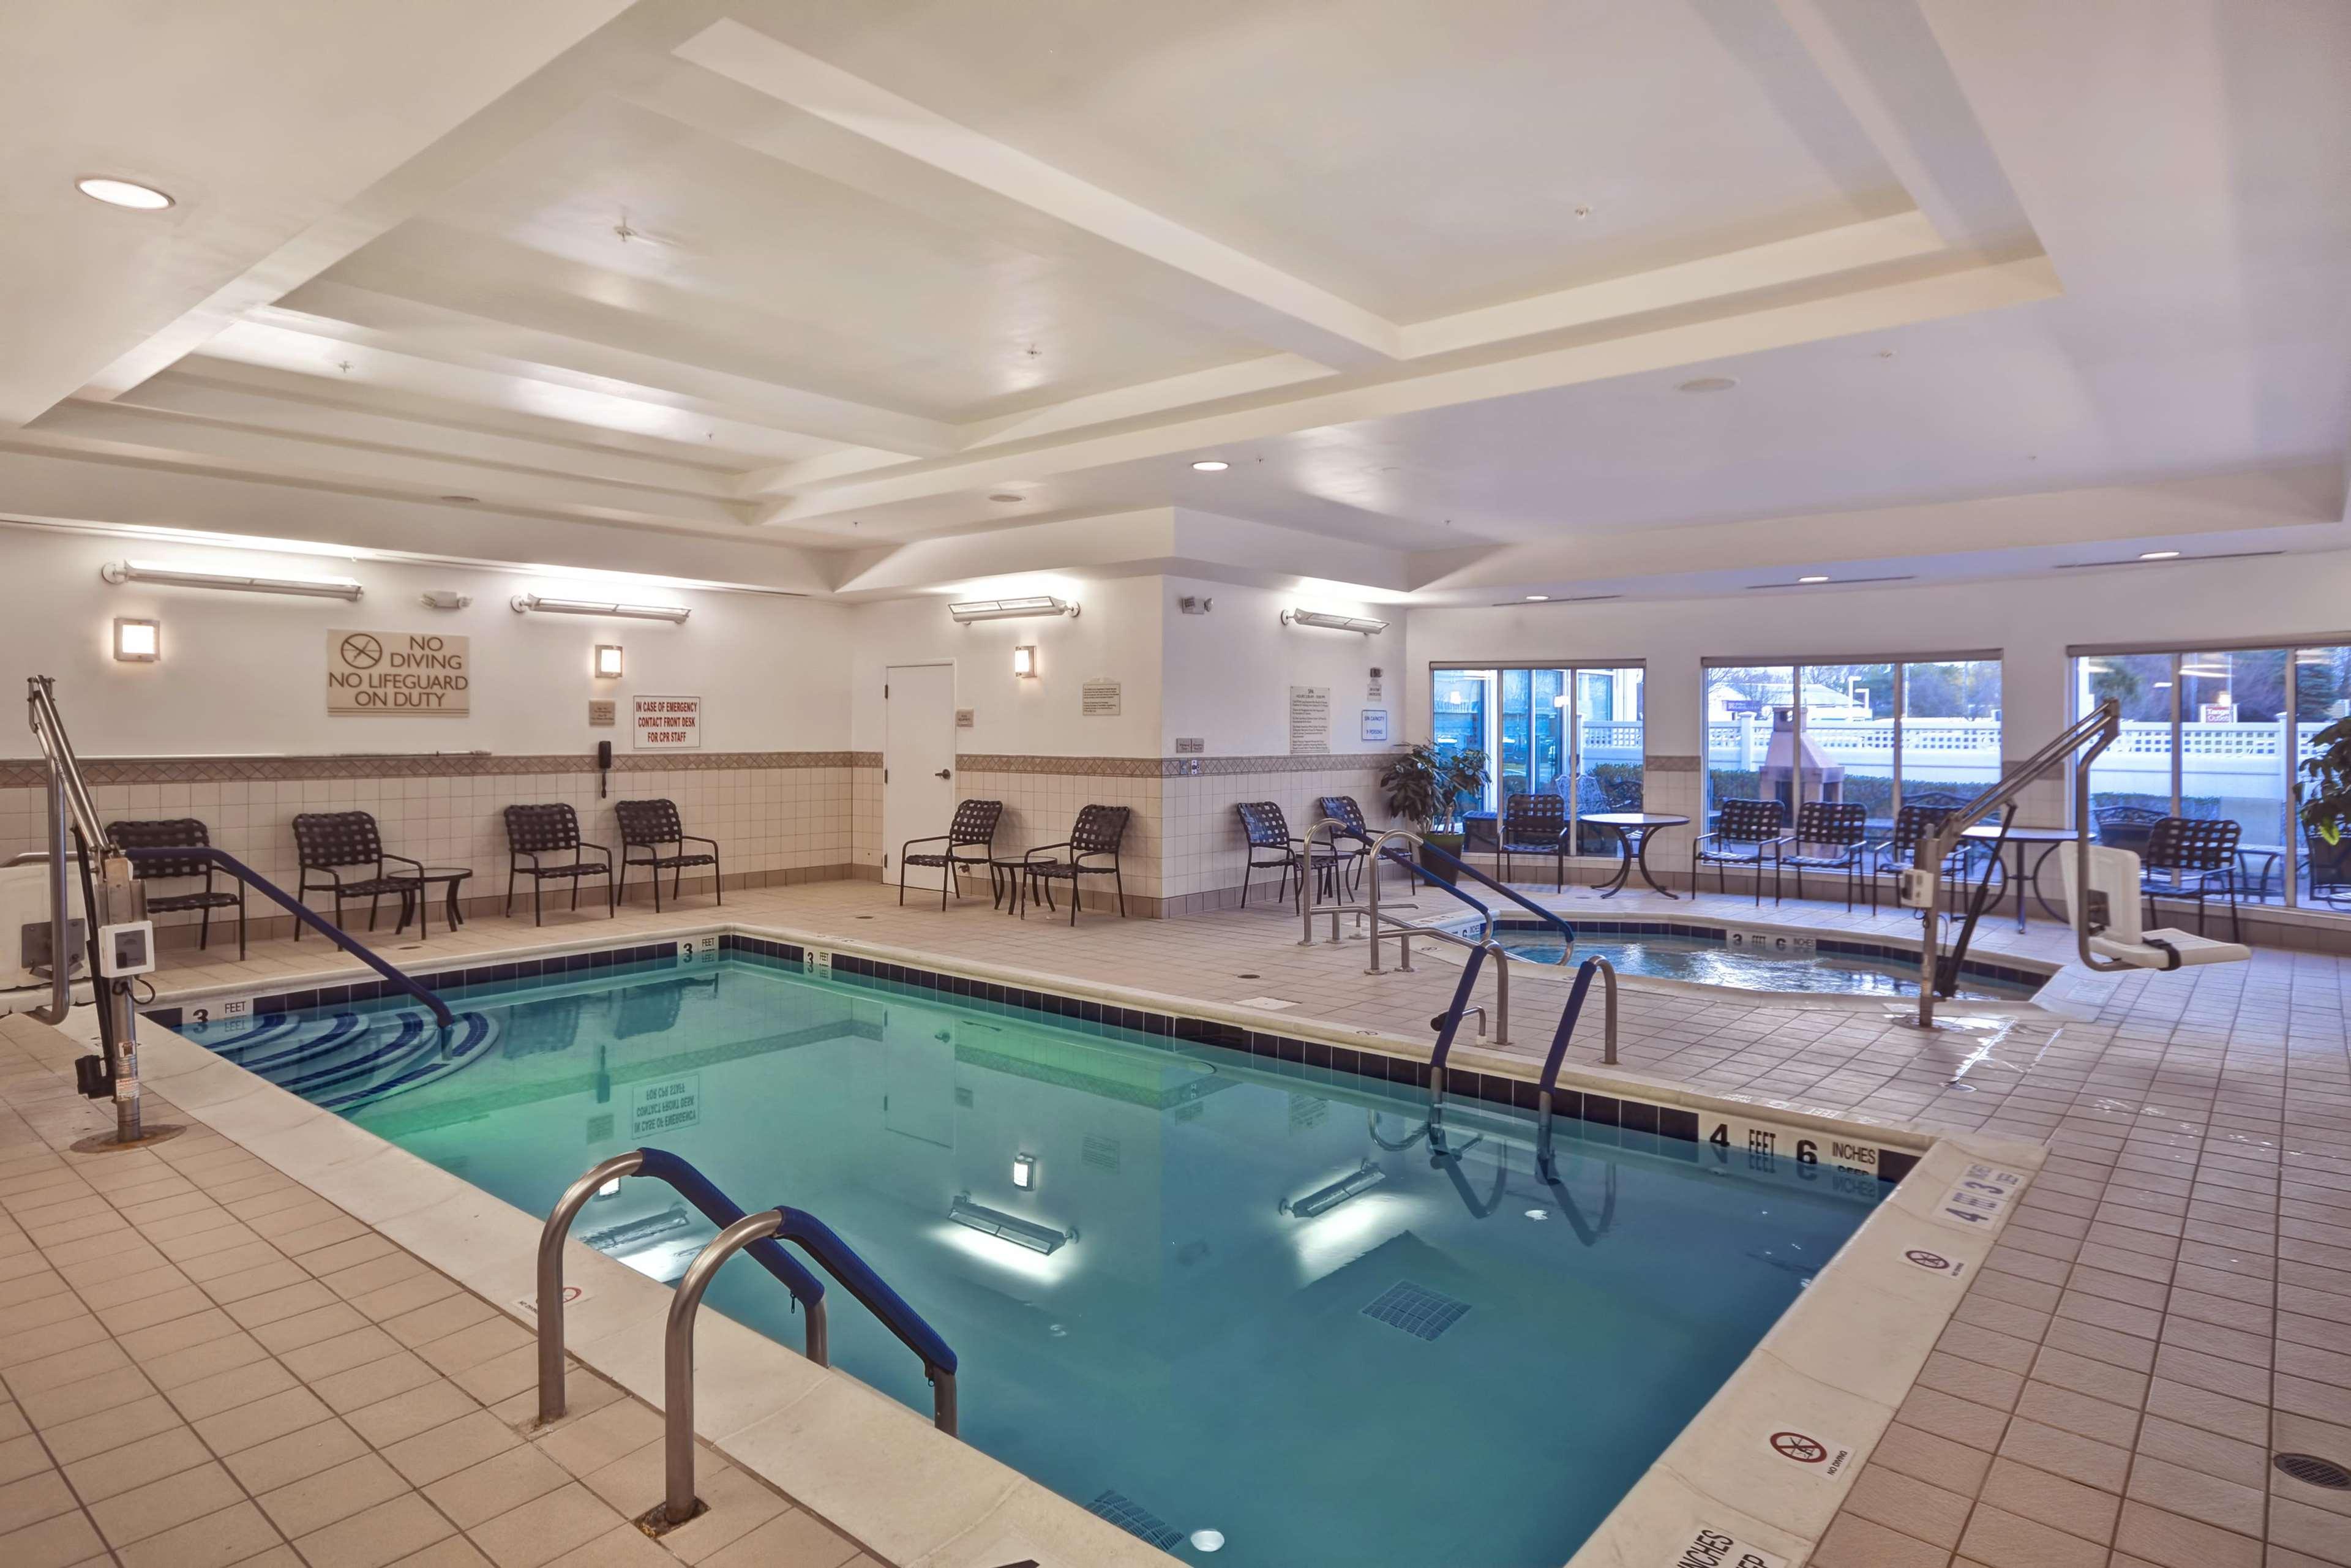 Hilton Garden Inn Riverhead image 21